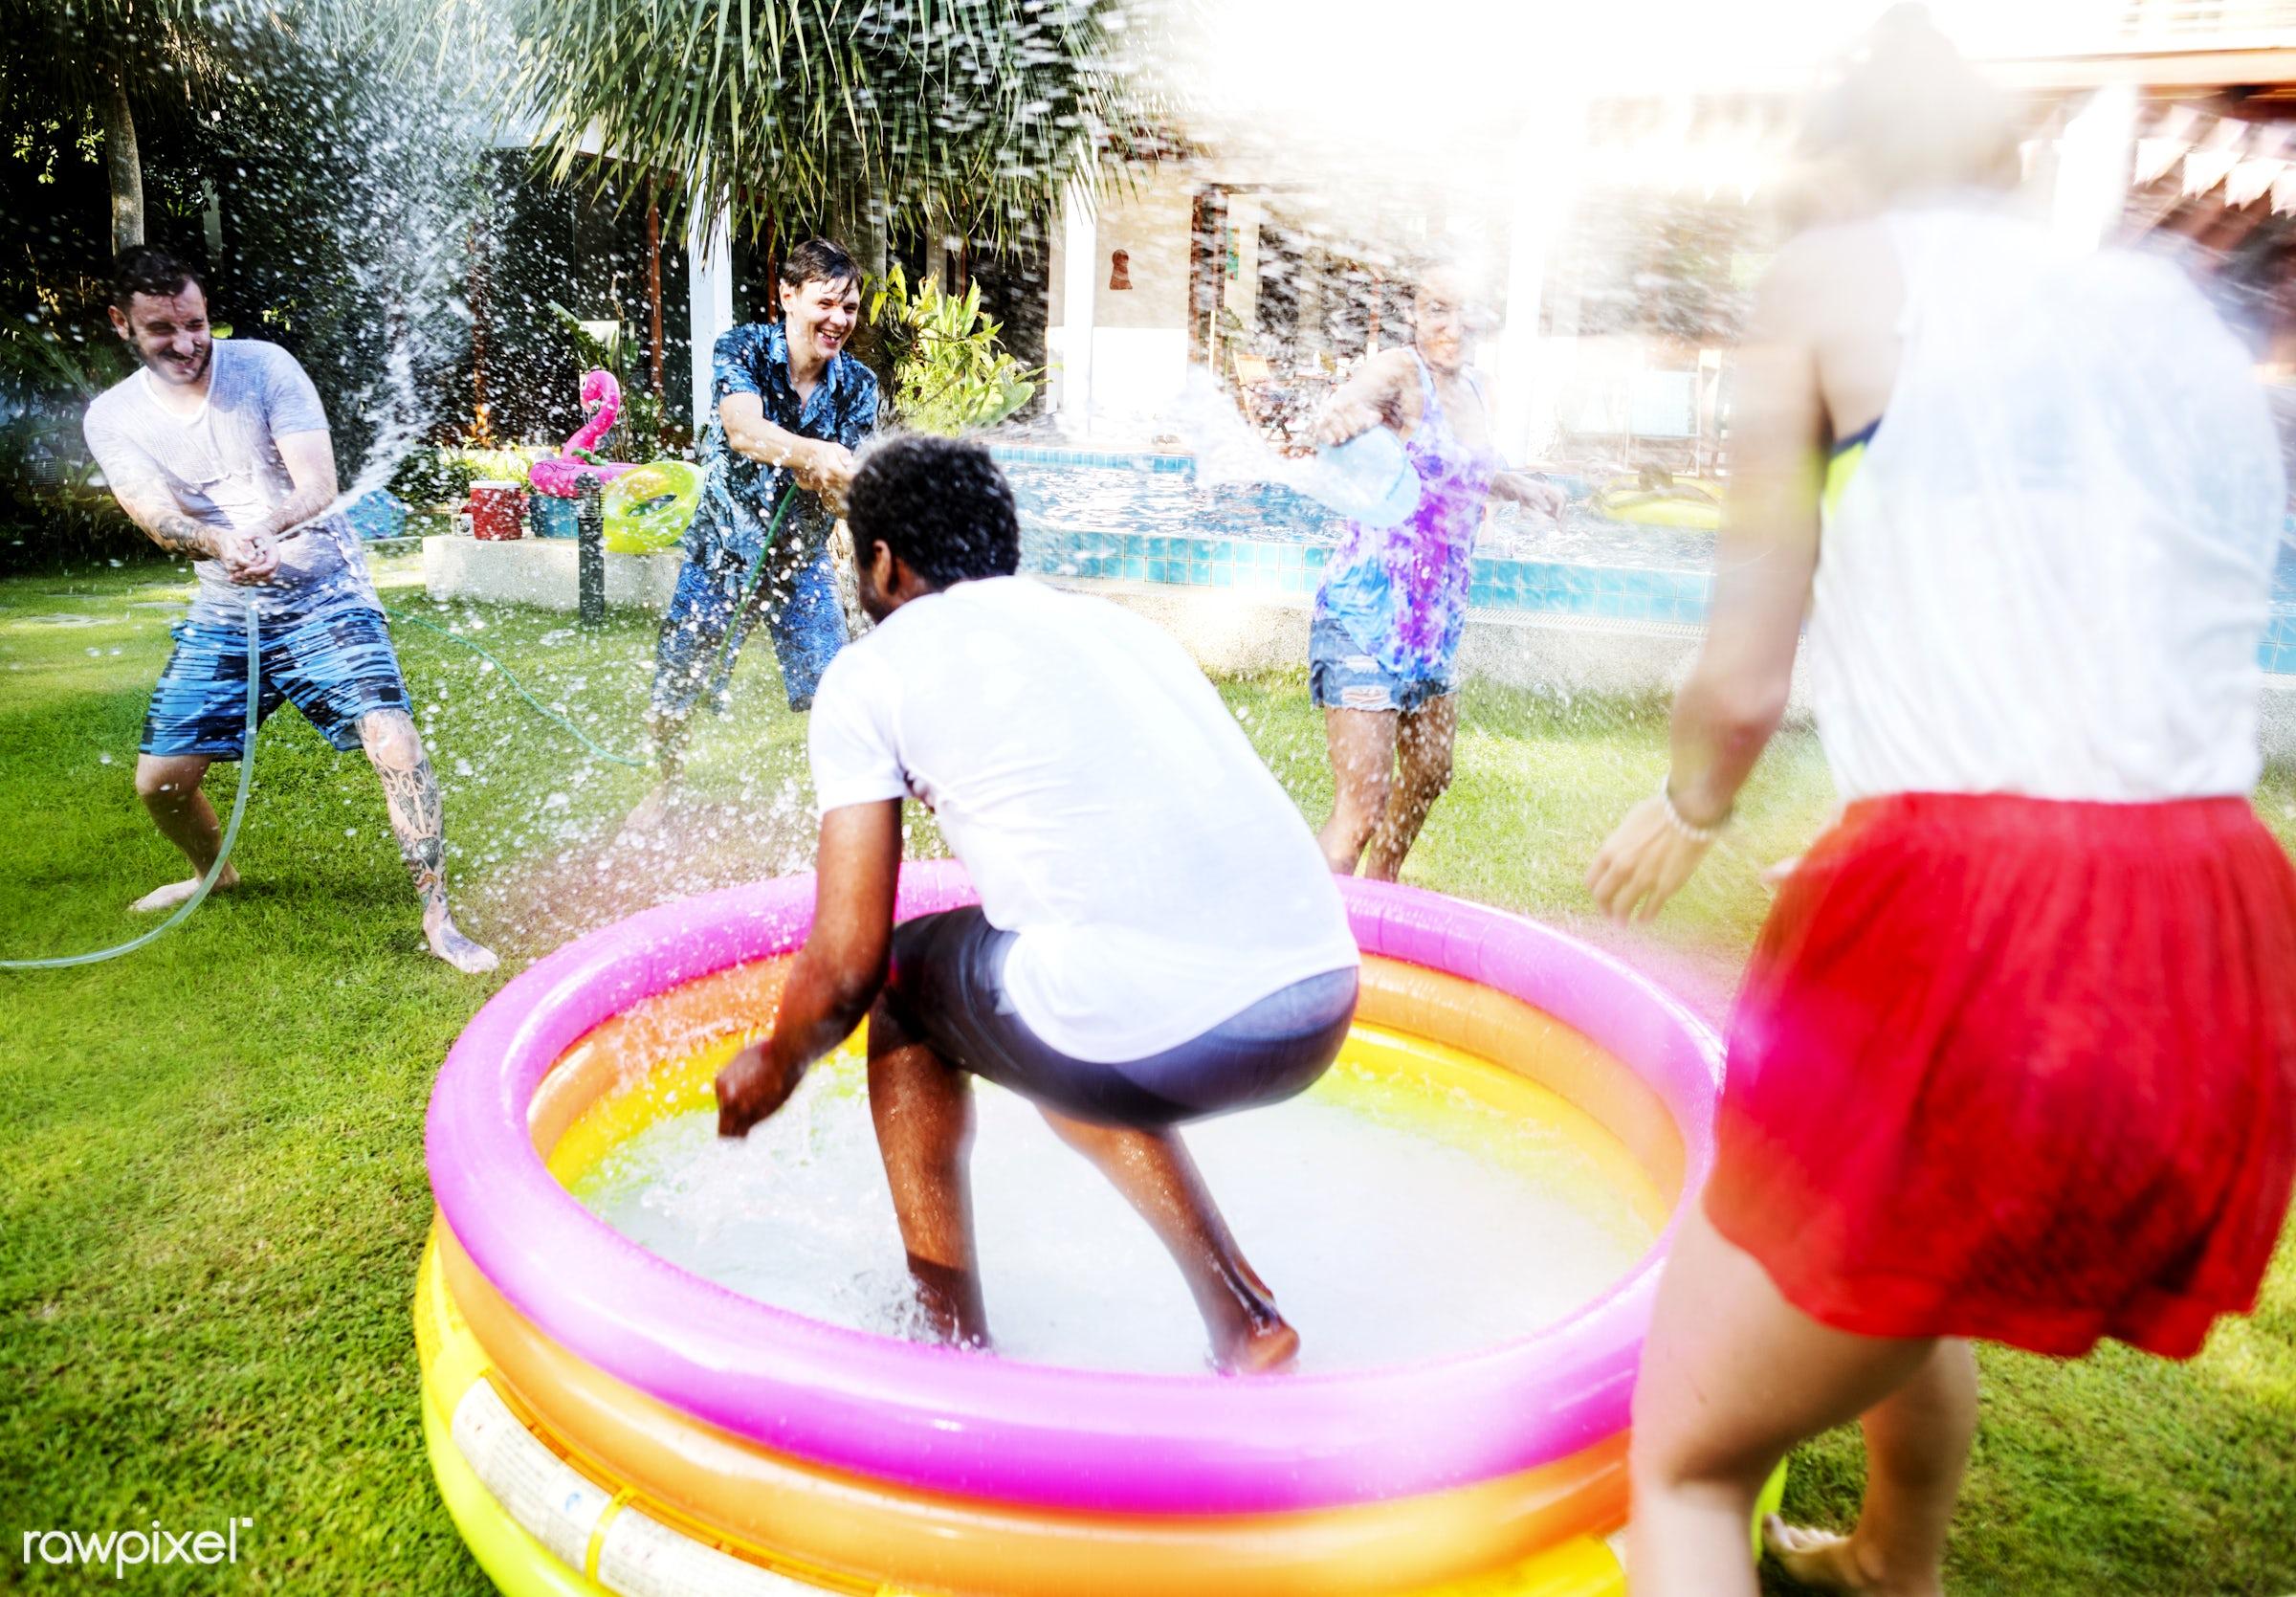 summer, holiday, fun, happy, joy, people, relax, diverse, pool, activity, backyard, casual, cheerful, enjoy, enjoyment, girl...